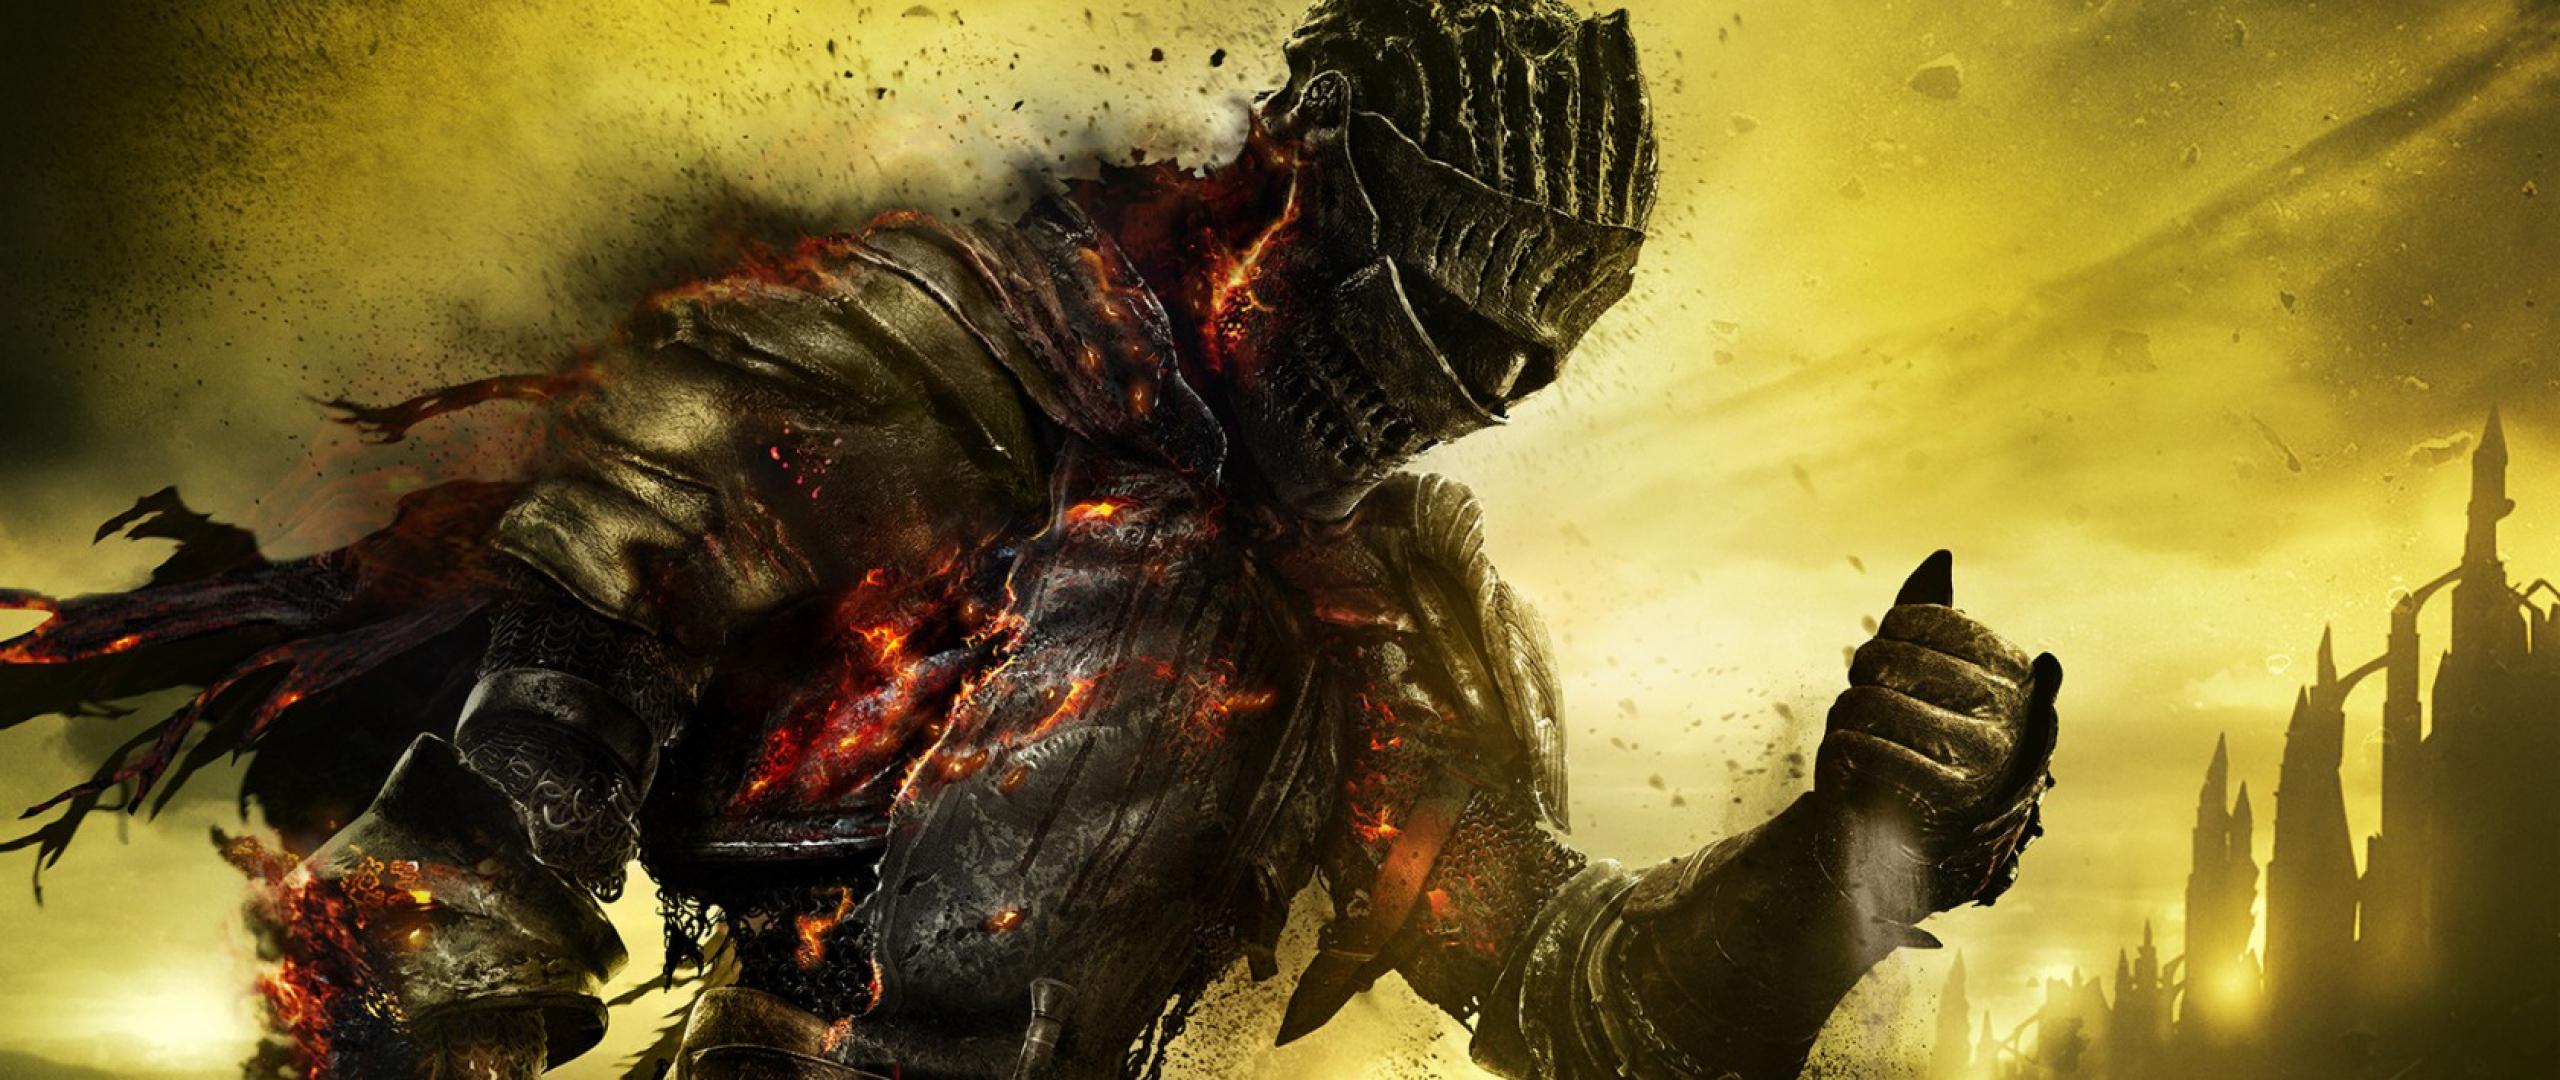 Free Download Dark Souls 3 Iii Dark Souls 3 Armor Burning Fire Ash